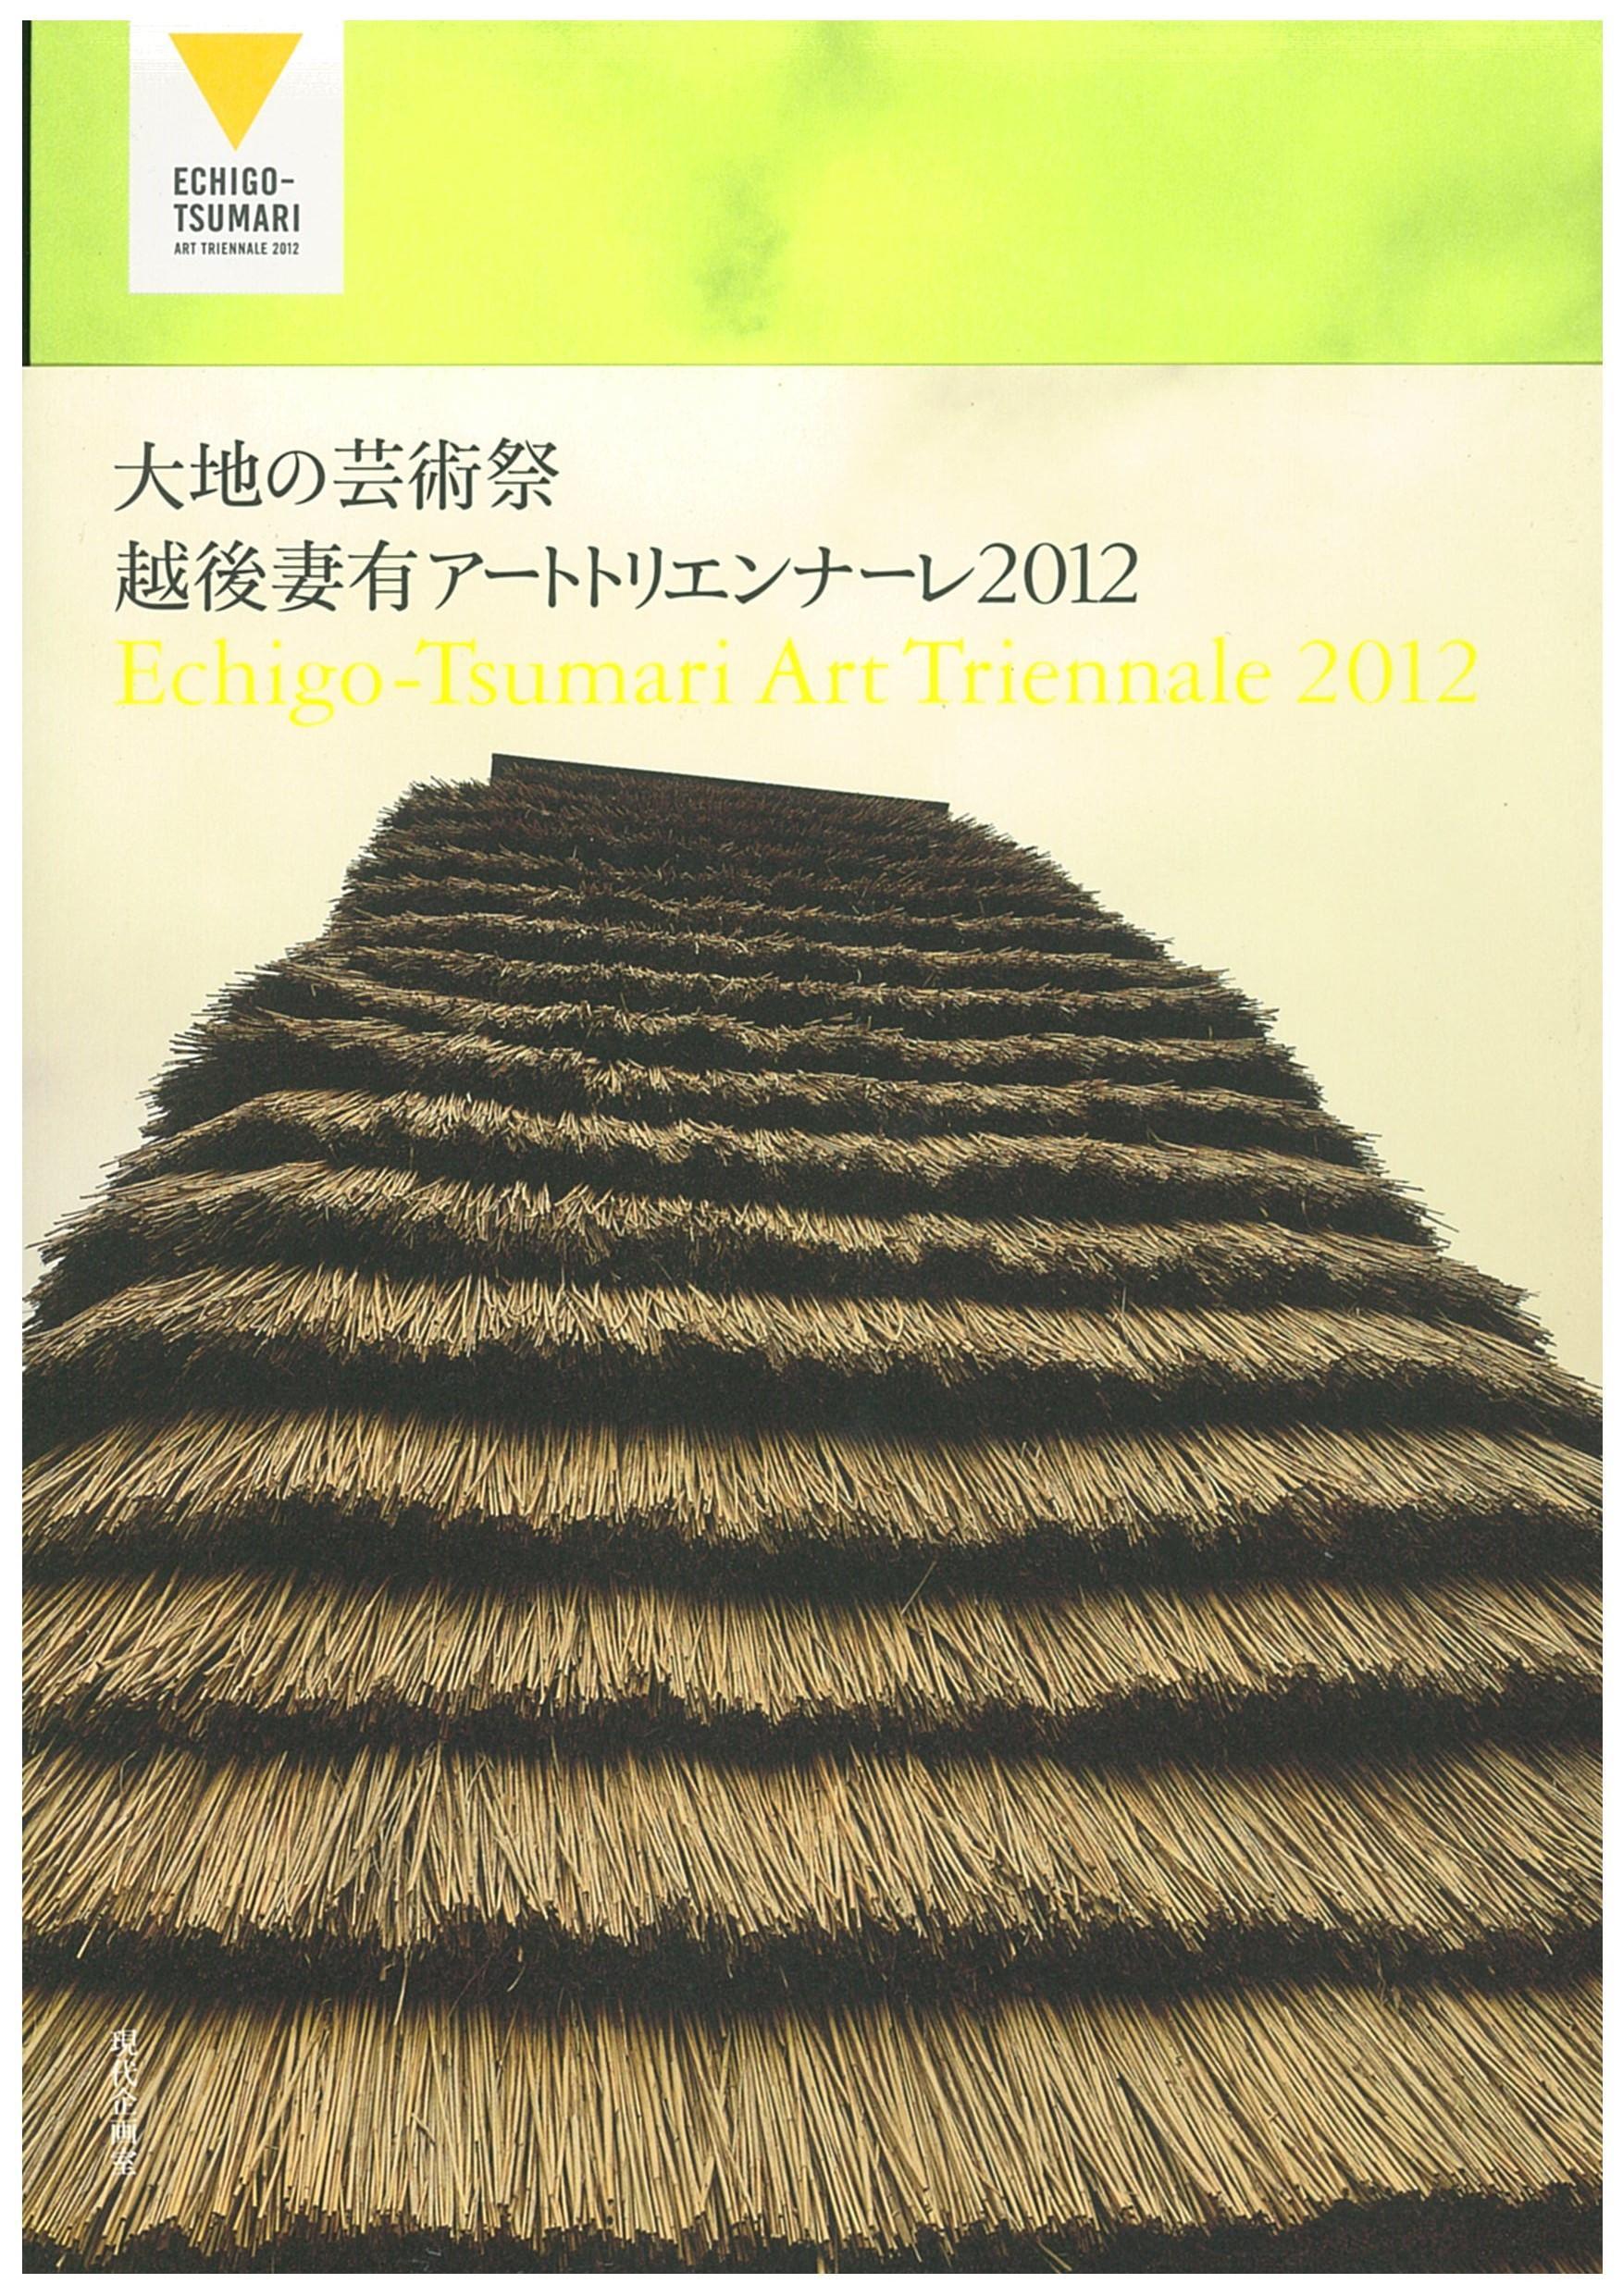 Official document book Echigo-Tsumari Art Triennale 2012